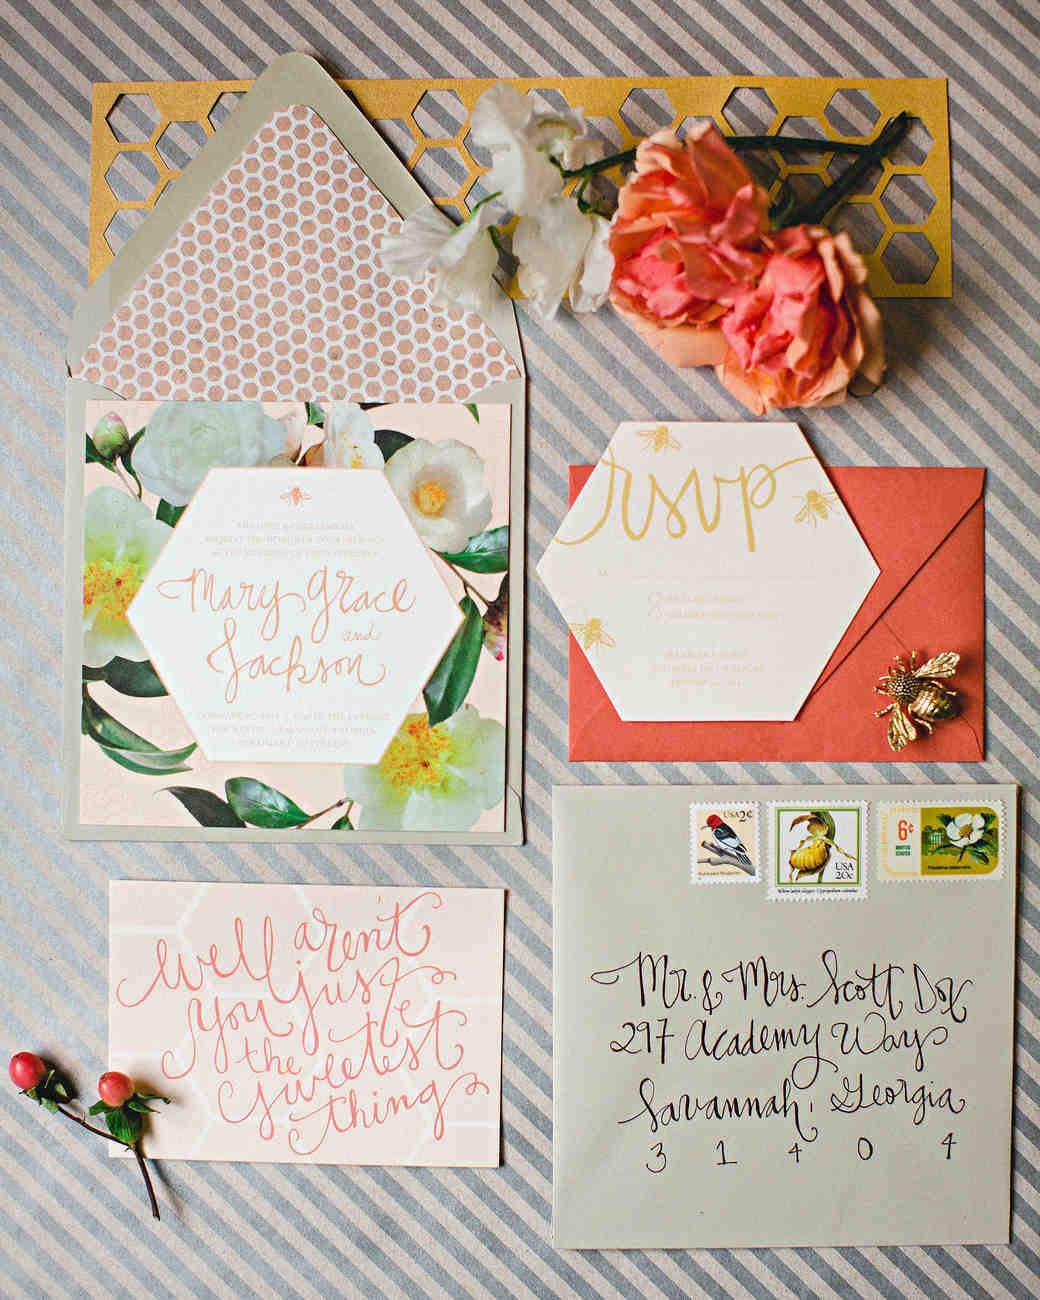 Honeycomb Wedding Inspiration, Invitation Suite with Honeycomb Motif